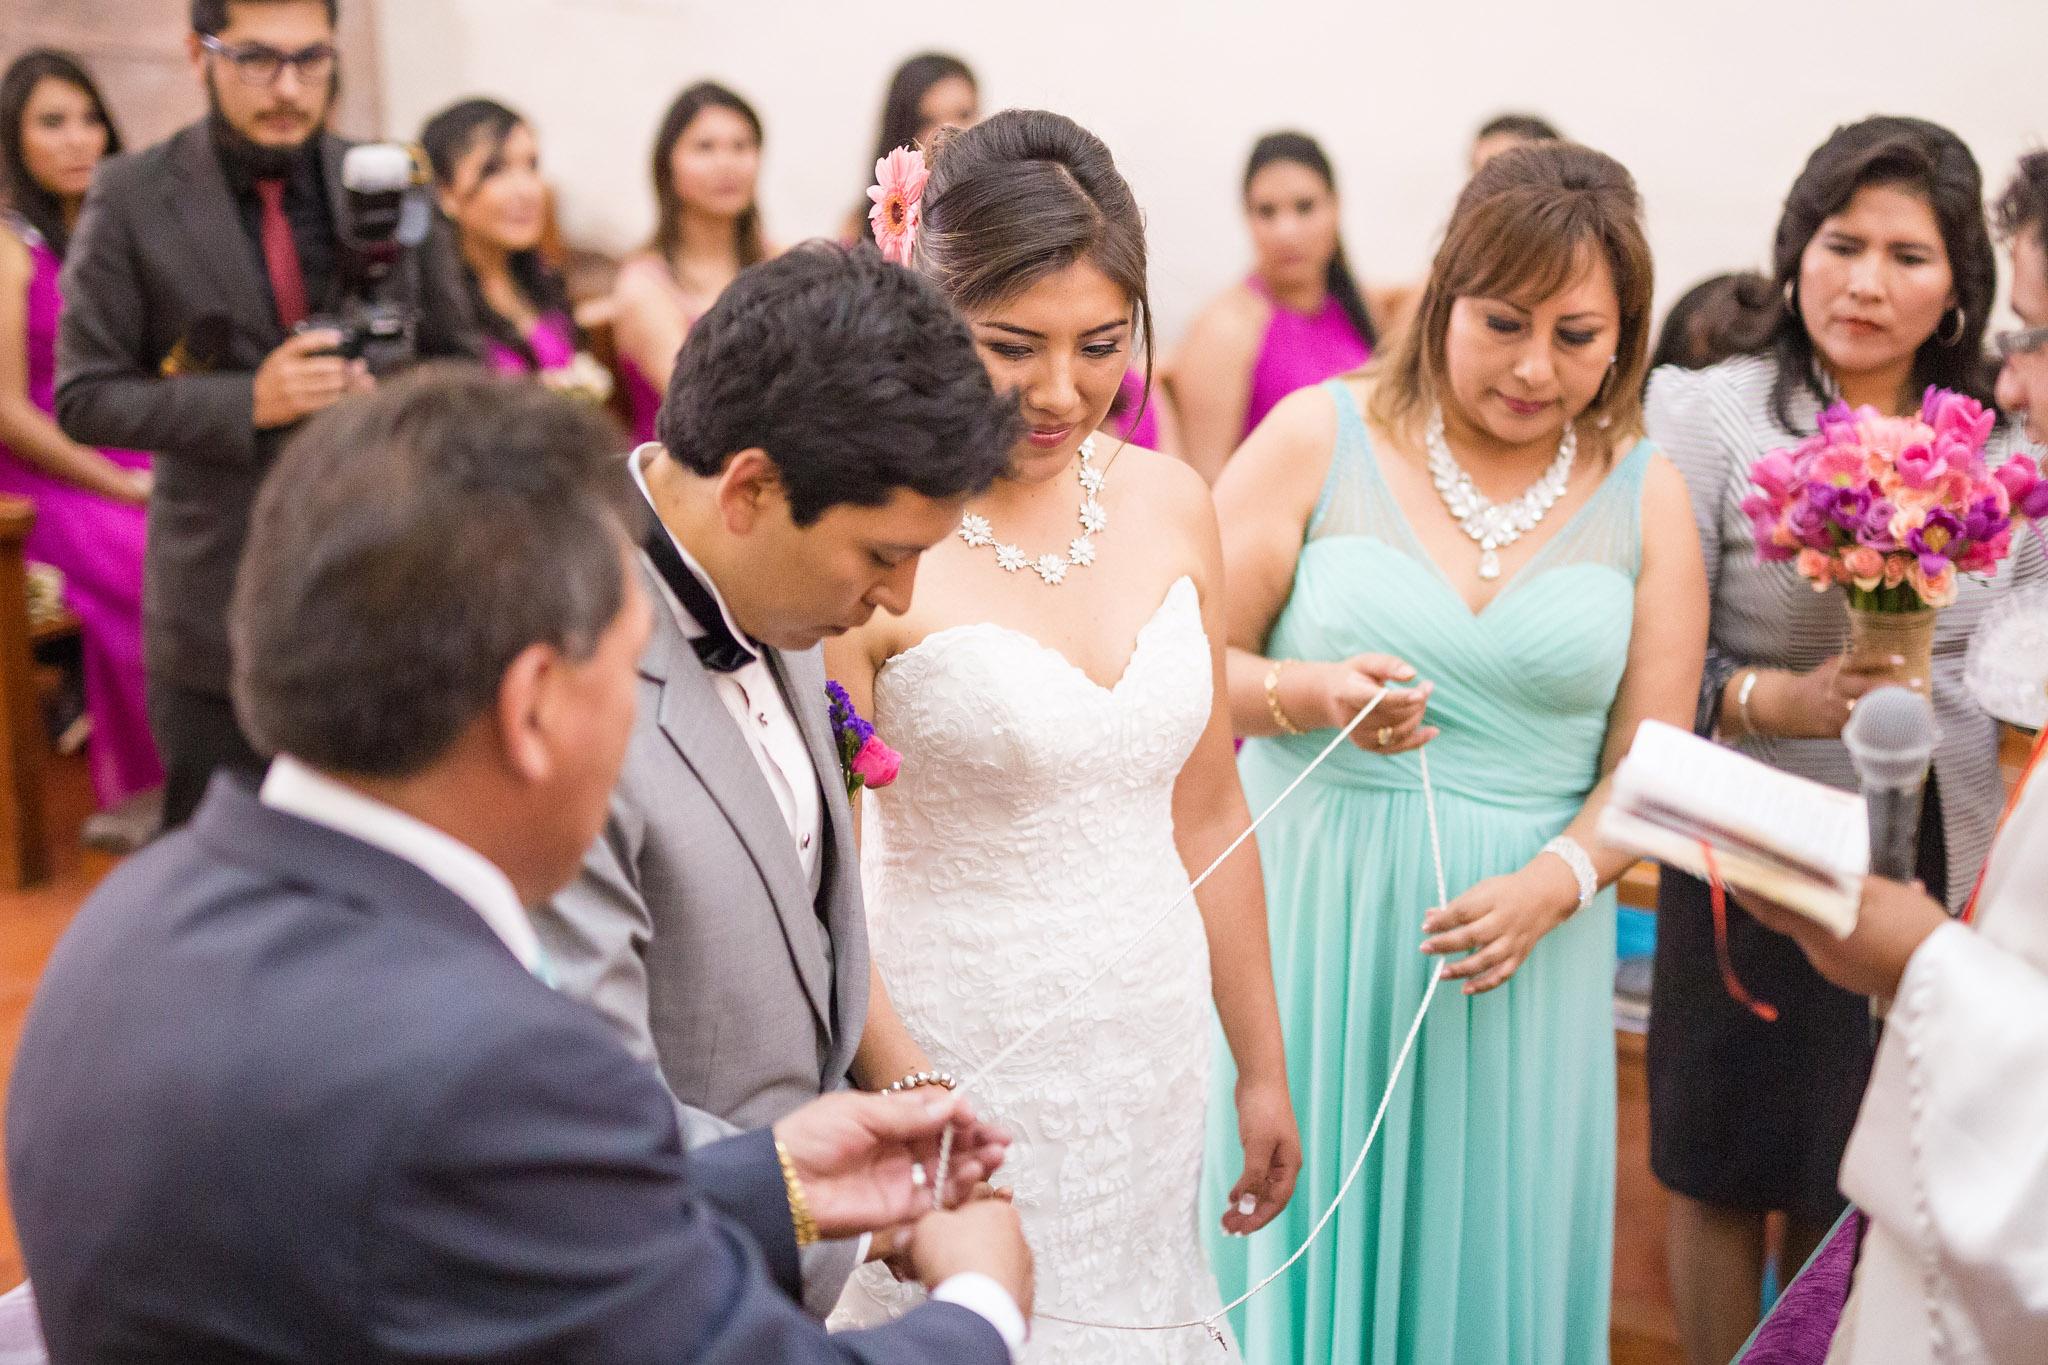 Wedding-Travellers-Destination-Wedding-Peru-Cusco-Hacienda-Sarapampa-Sacred-Valley-cord-lasso